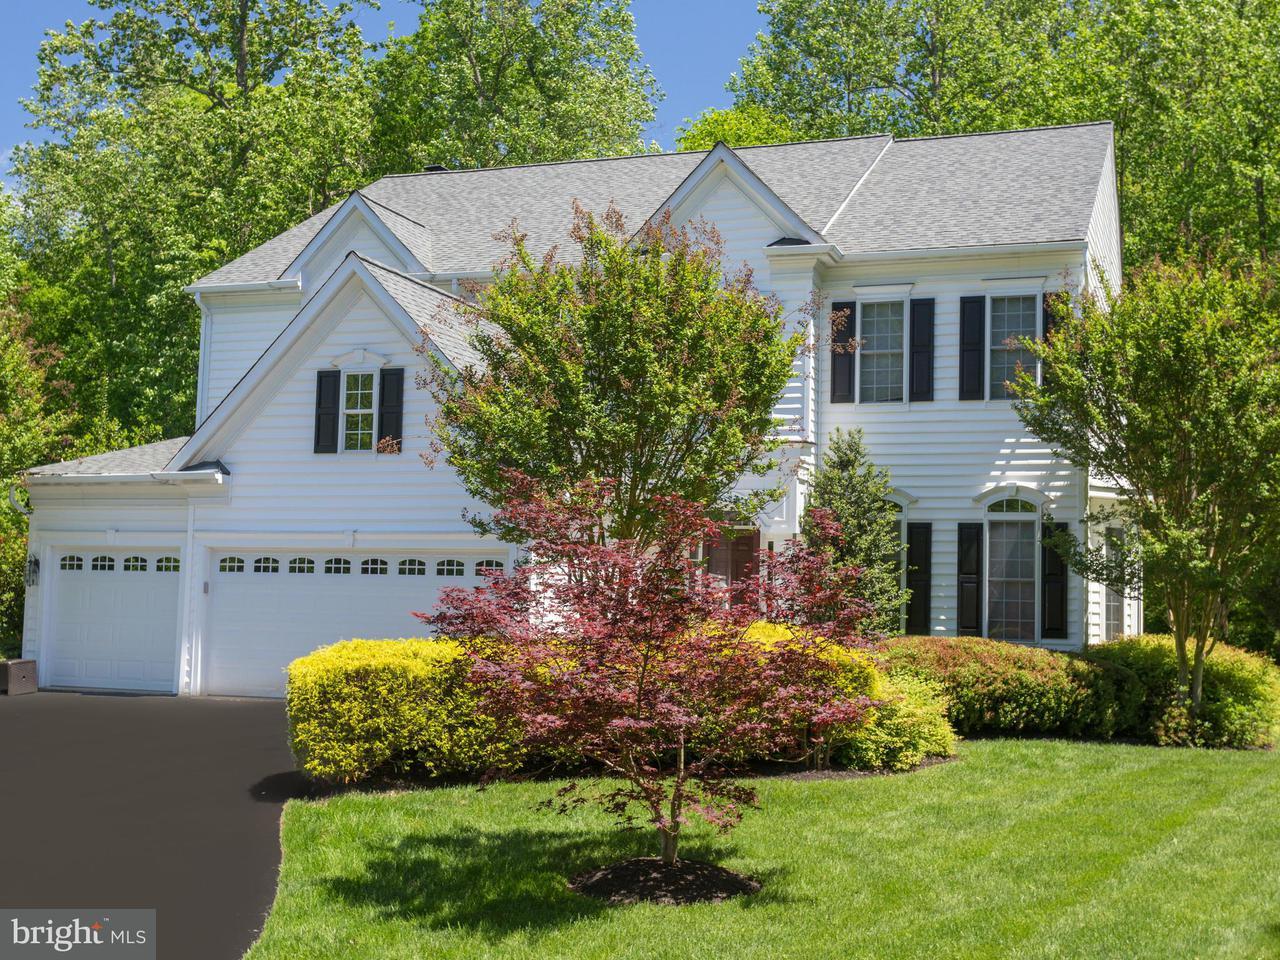 Single Family Home for Sale at 7434 Goshen Court 7434 Goshen Court Manassas, Virginia 20112 United States